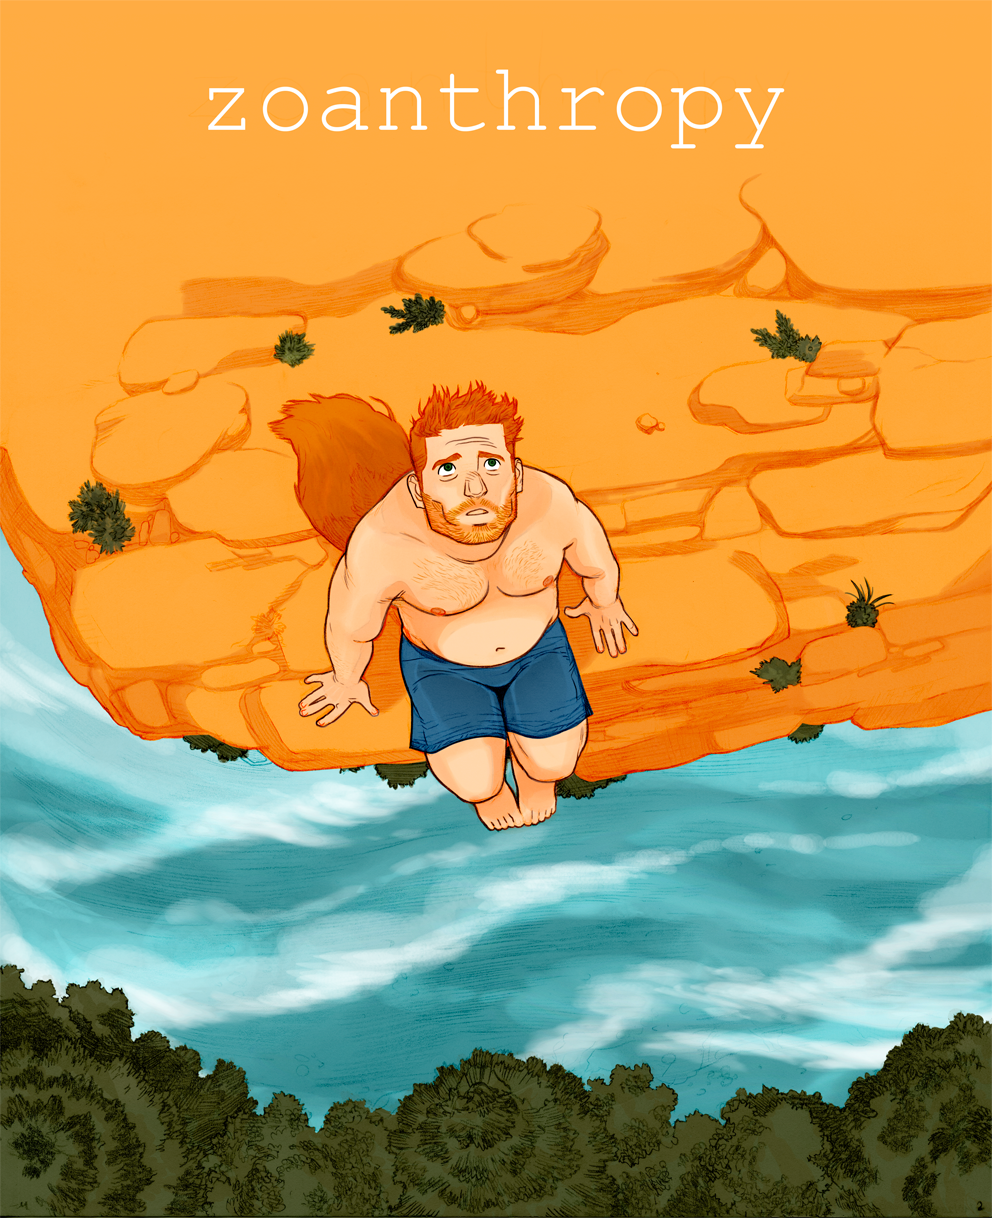 Gallery-Zoanthropy.png